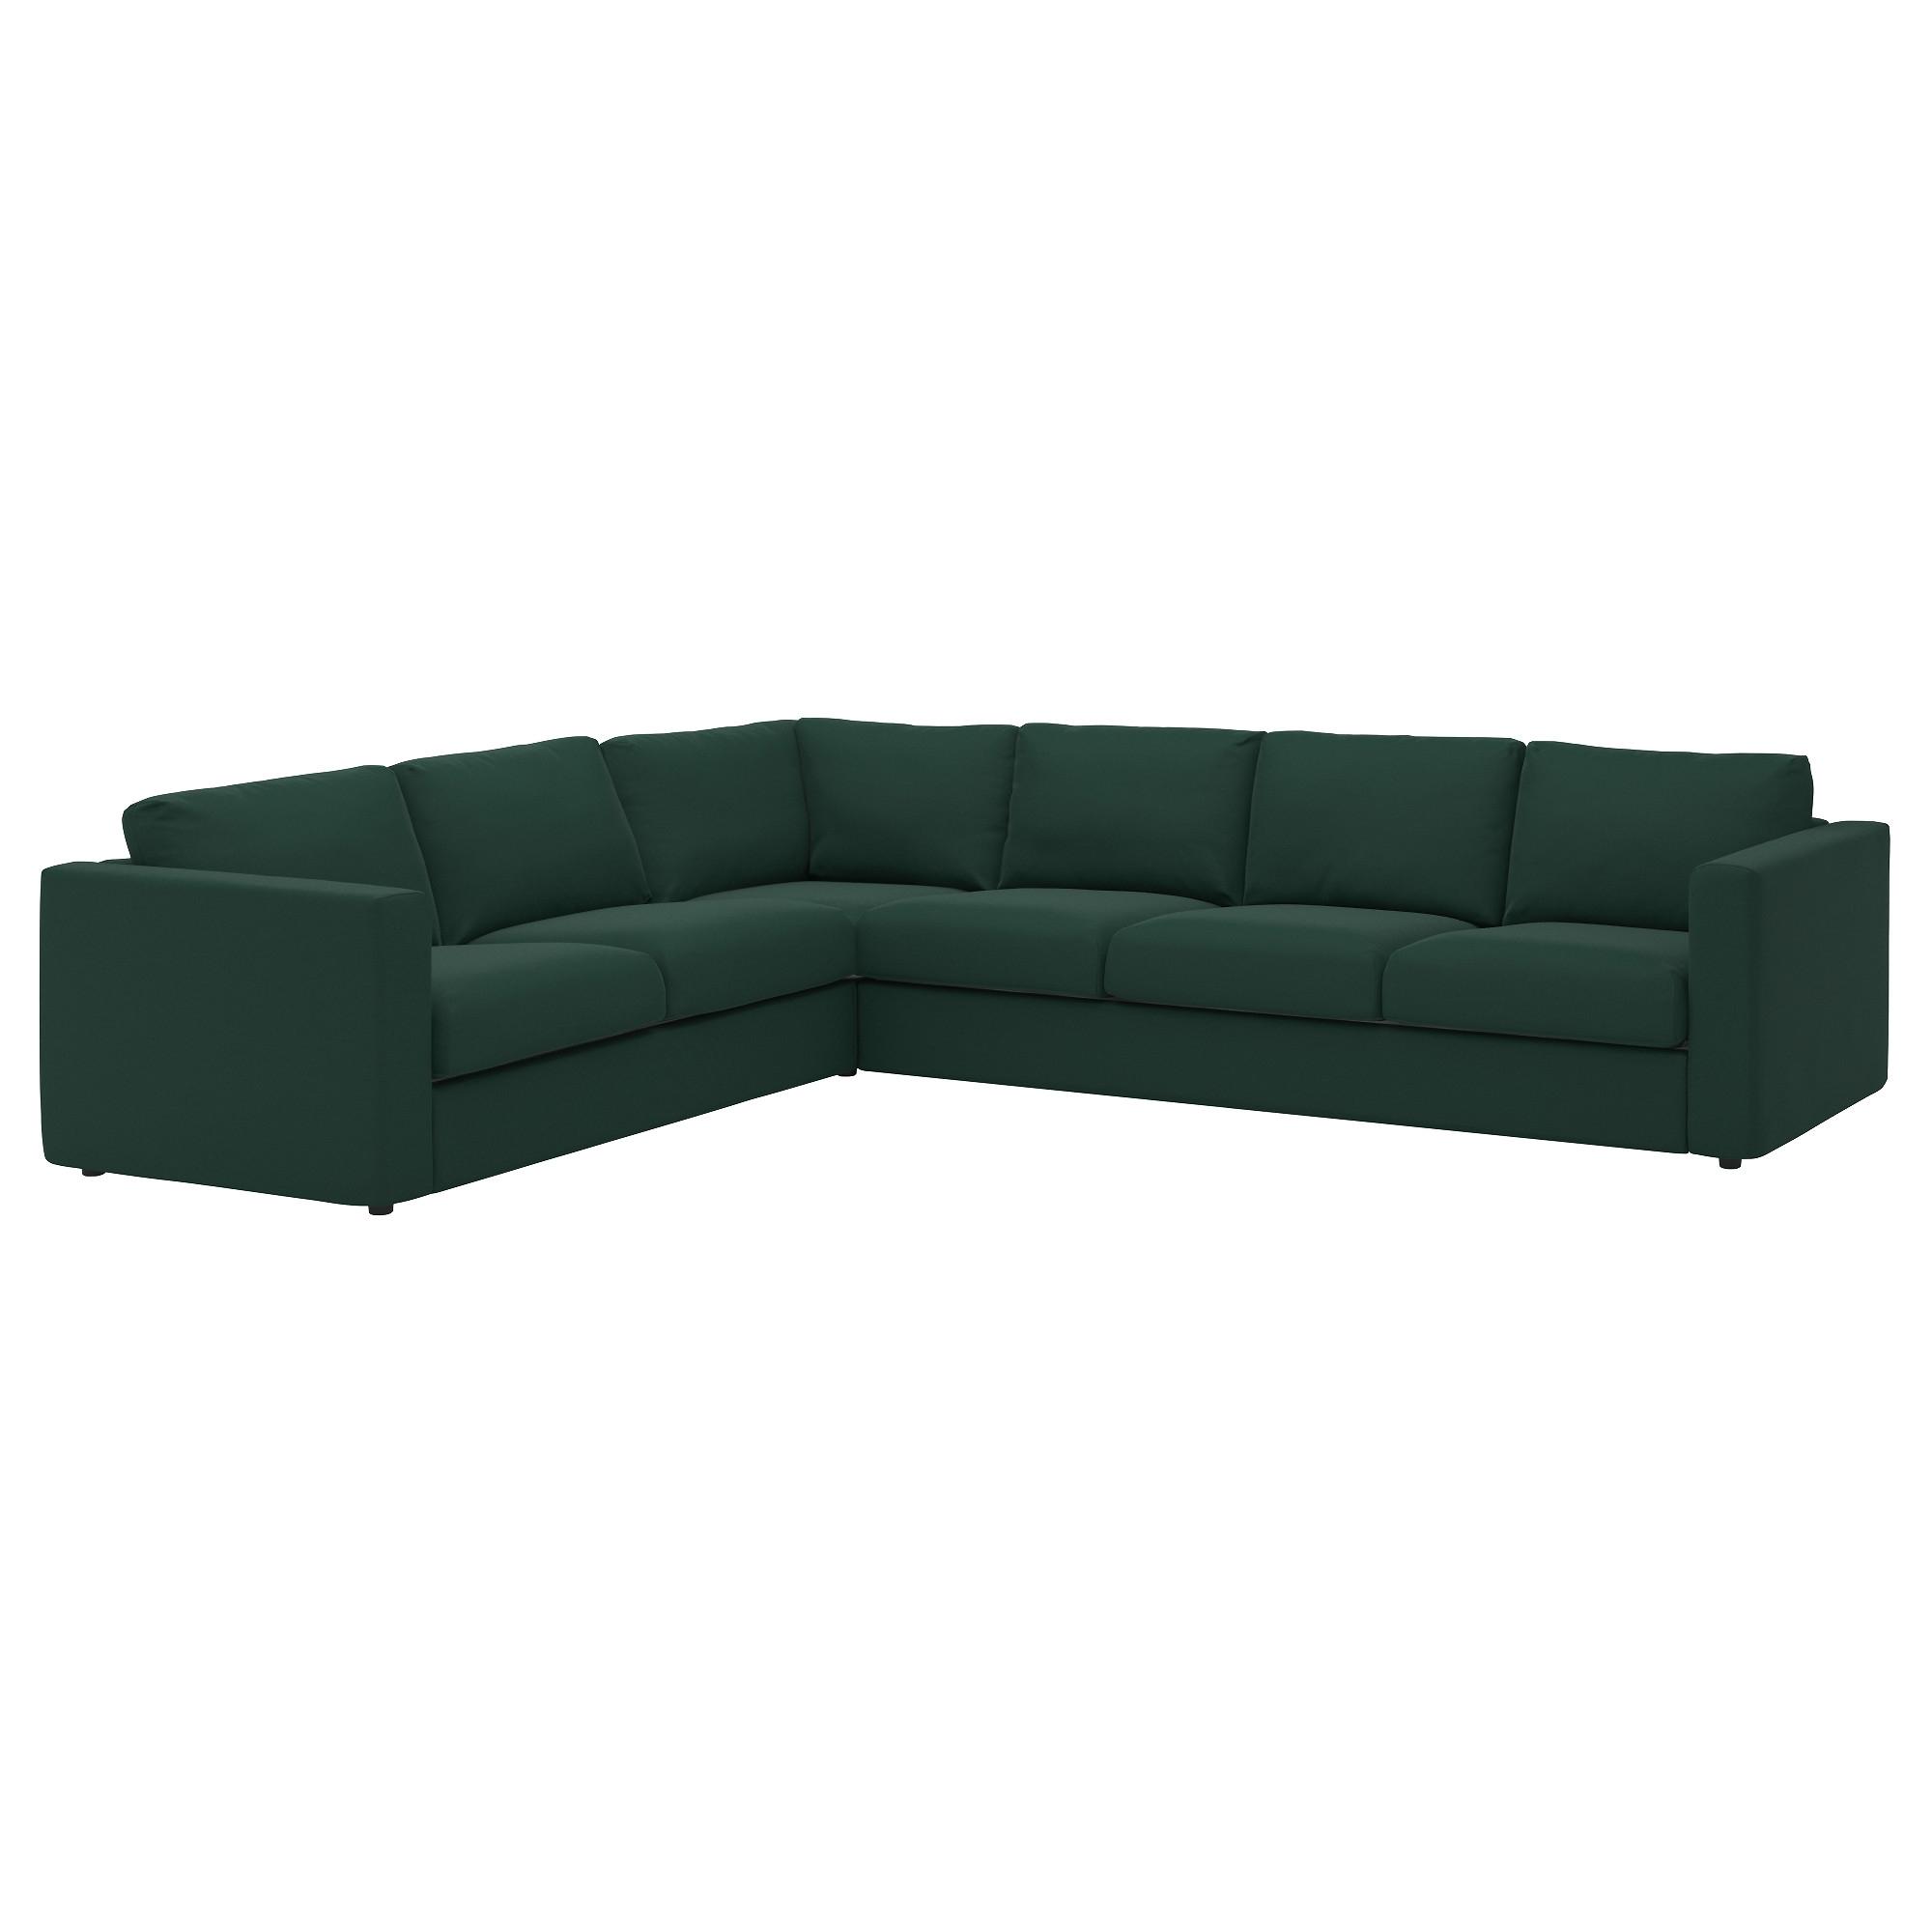 Vimle Sofa 5 Plazas Esquina Gunnared Verde Oscuro